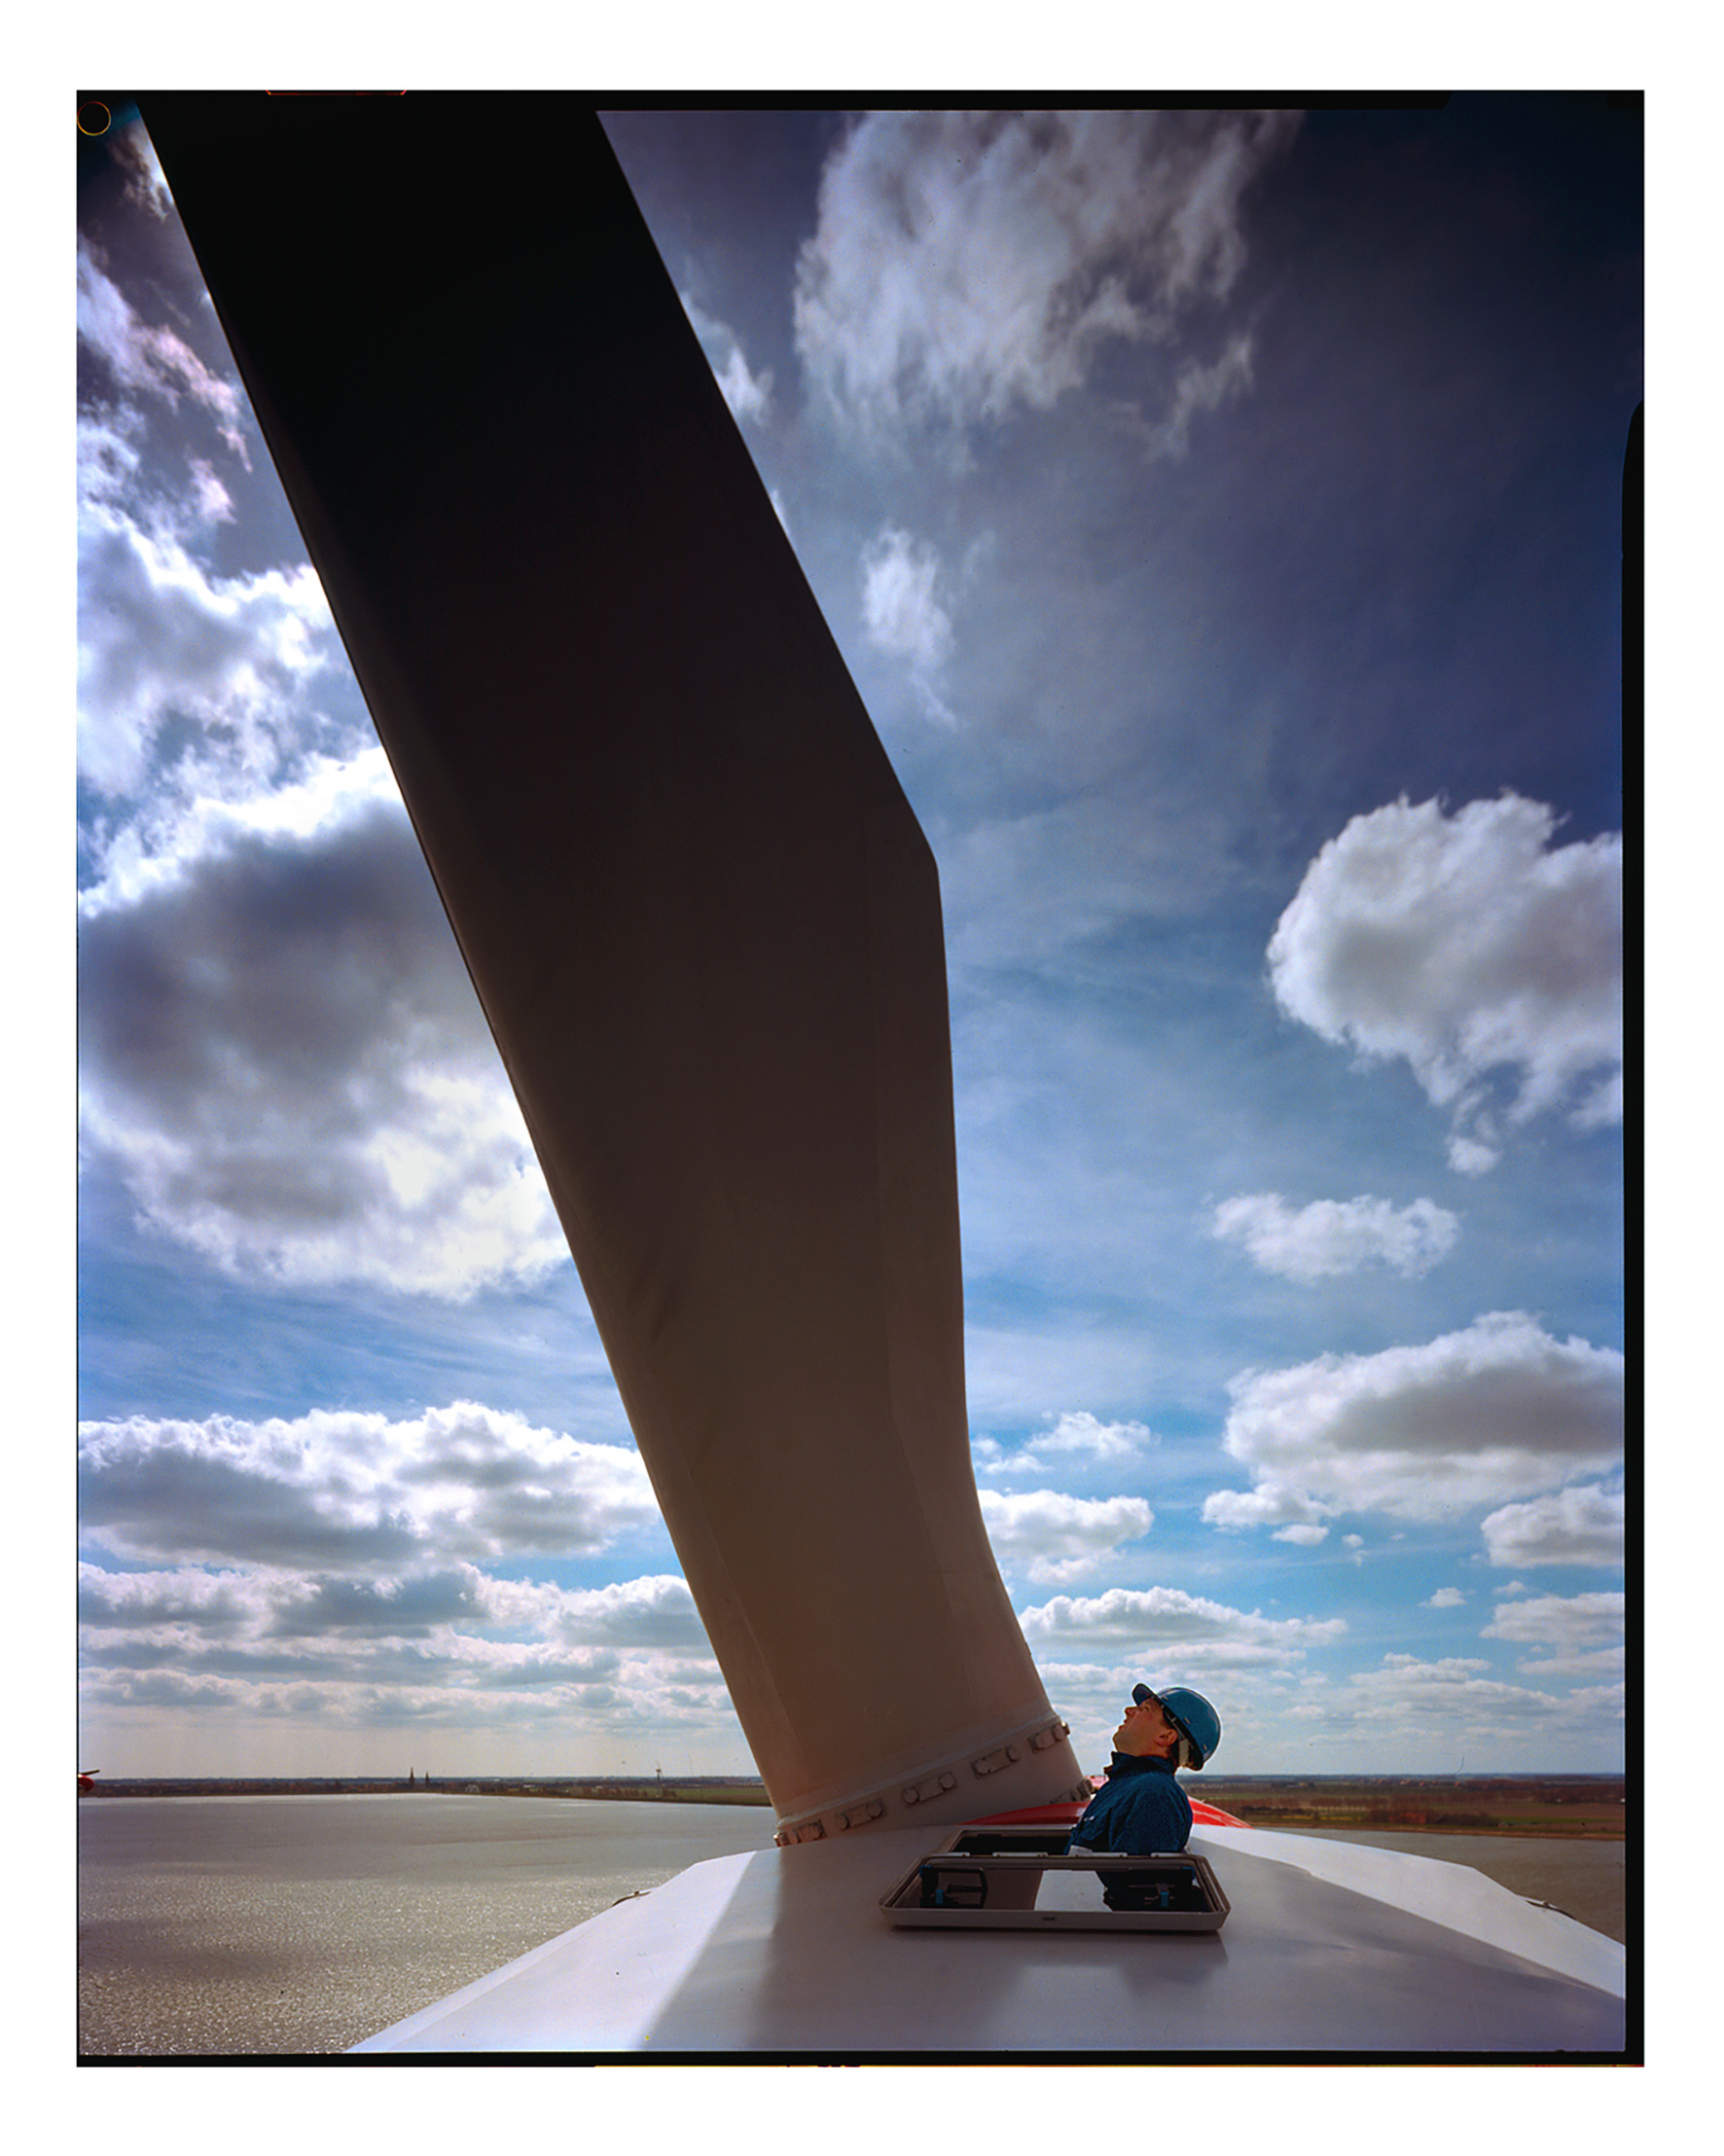 'De Westenwind'. First prize, ABC Fotojaarprijs, 1998